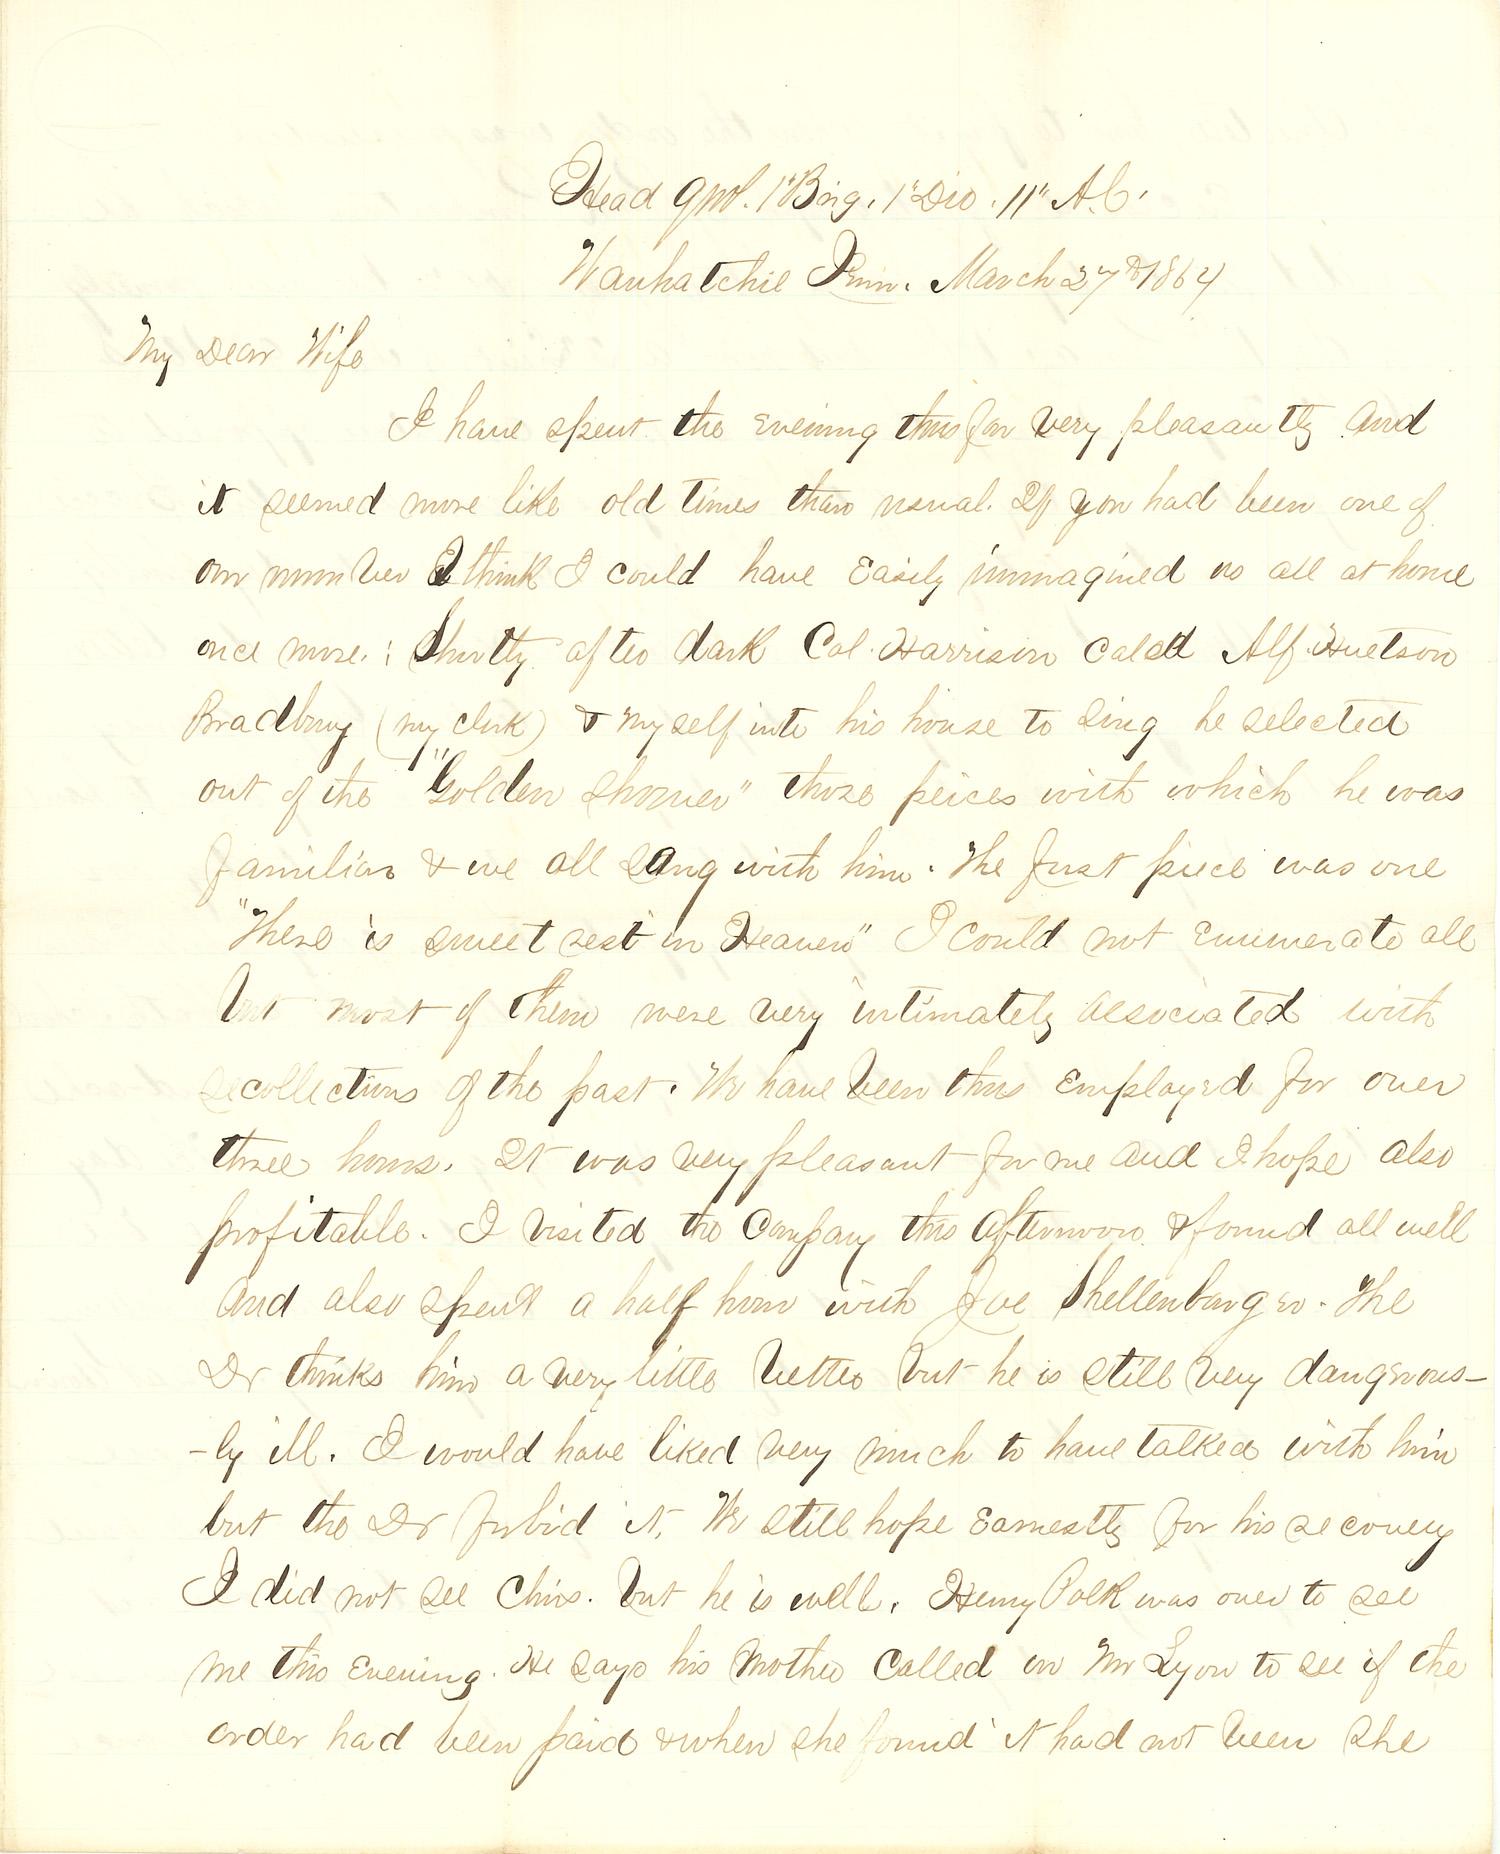 Joseph Culver Letter, March 27, 1864, Letter 2, Page 1